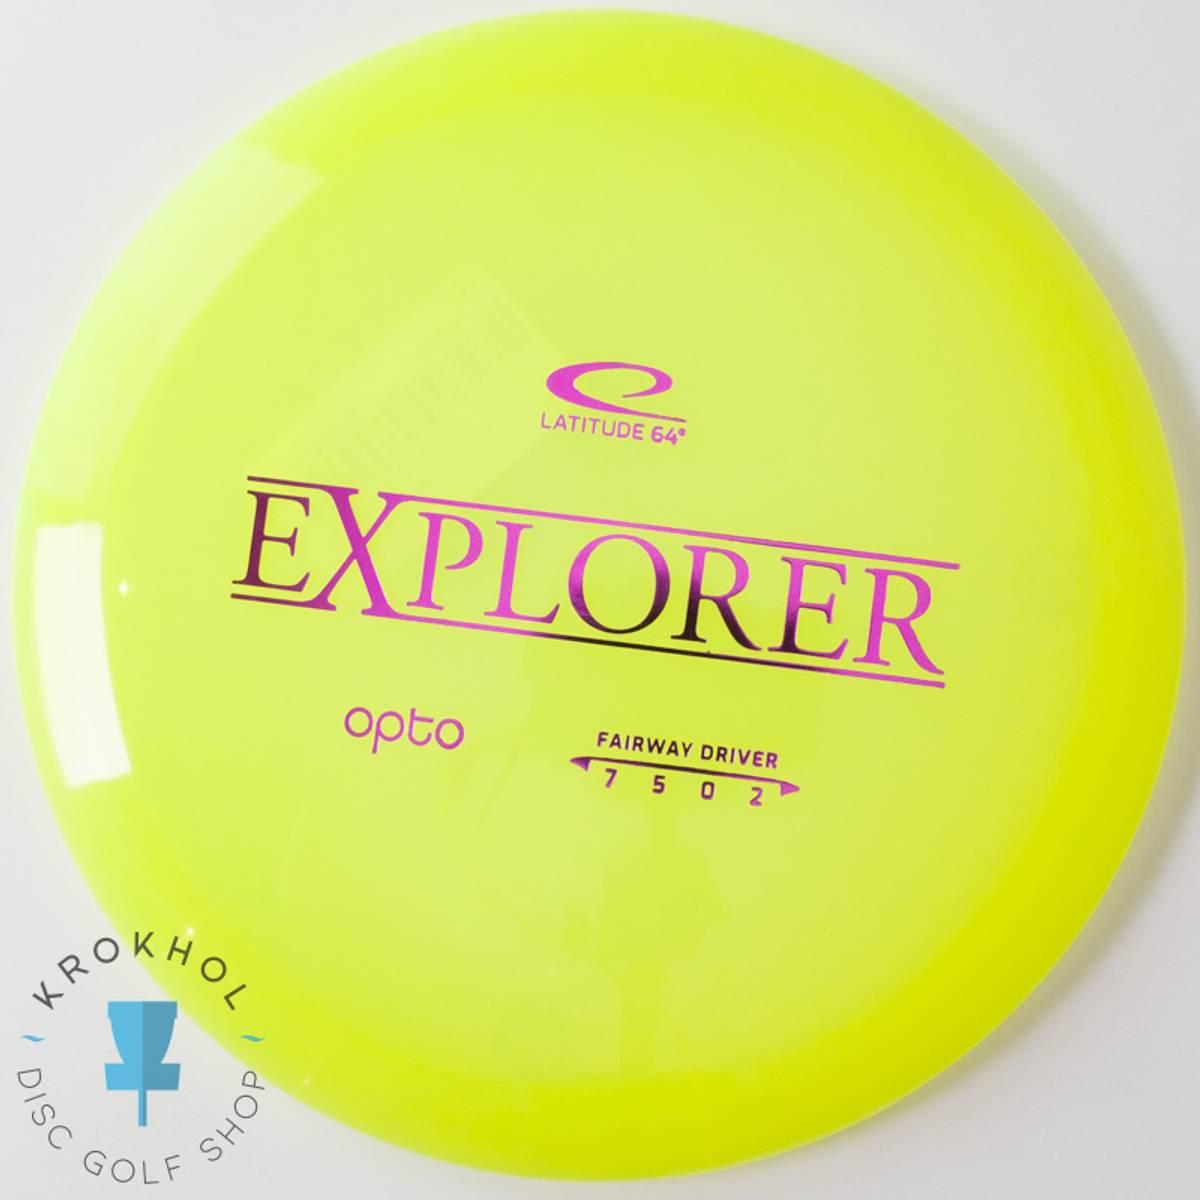 Opto Explorer